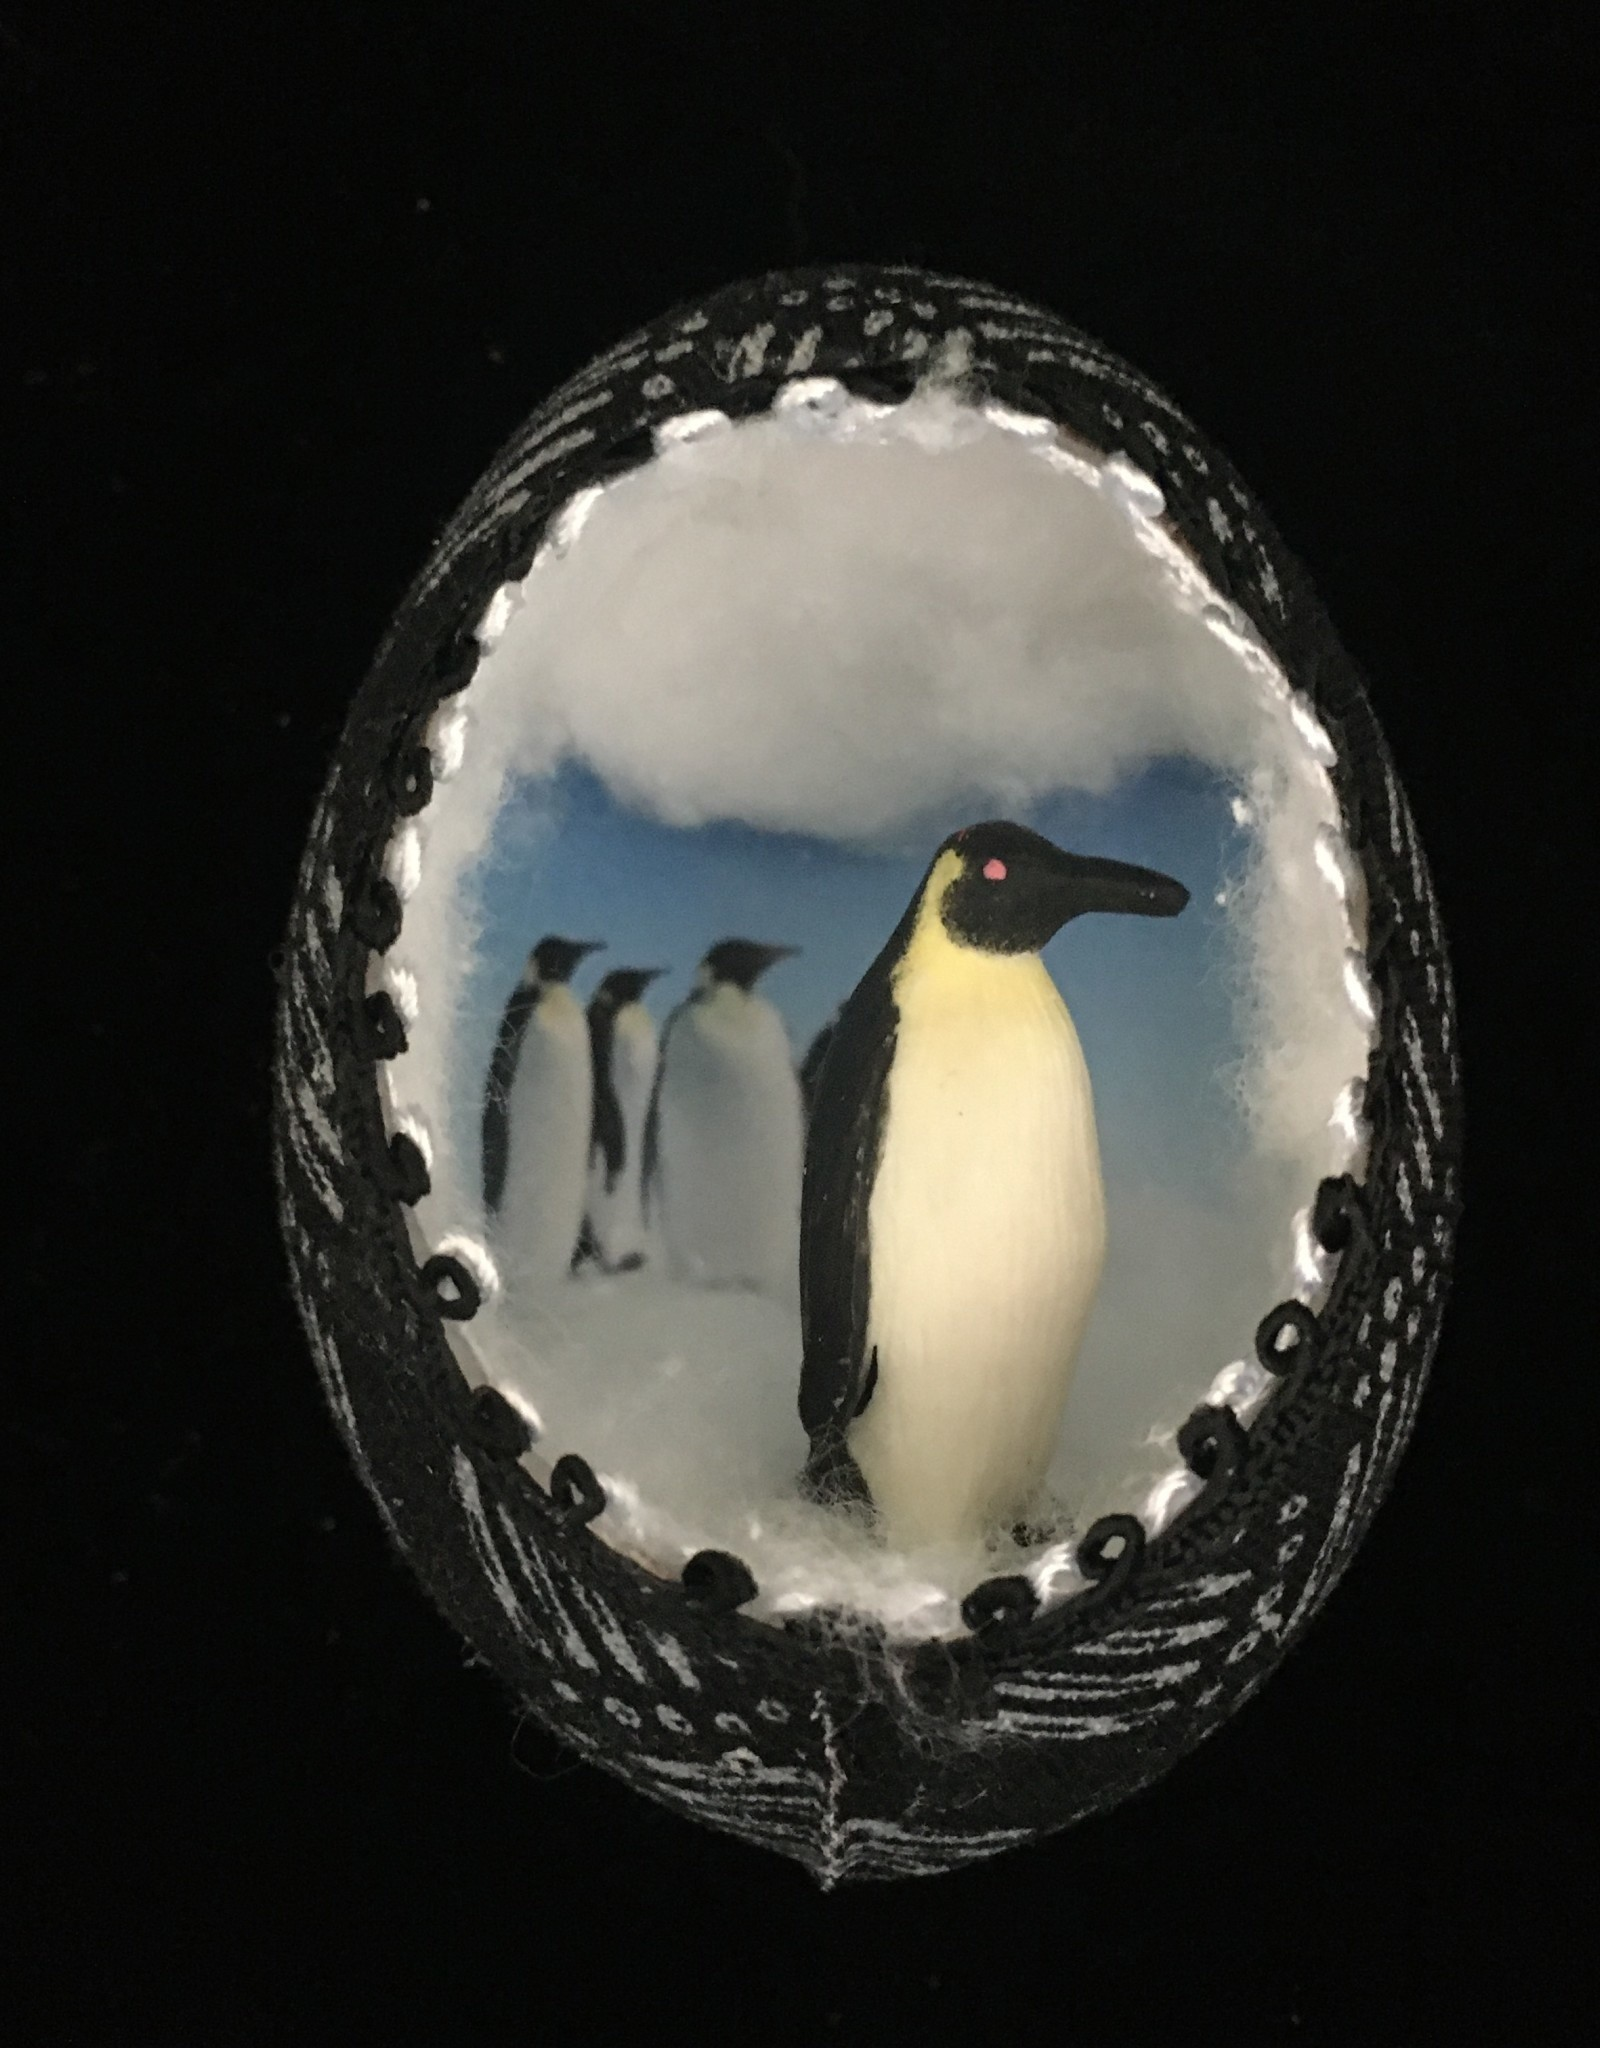 Ammi Brooks Penguin Real Egg Ornament